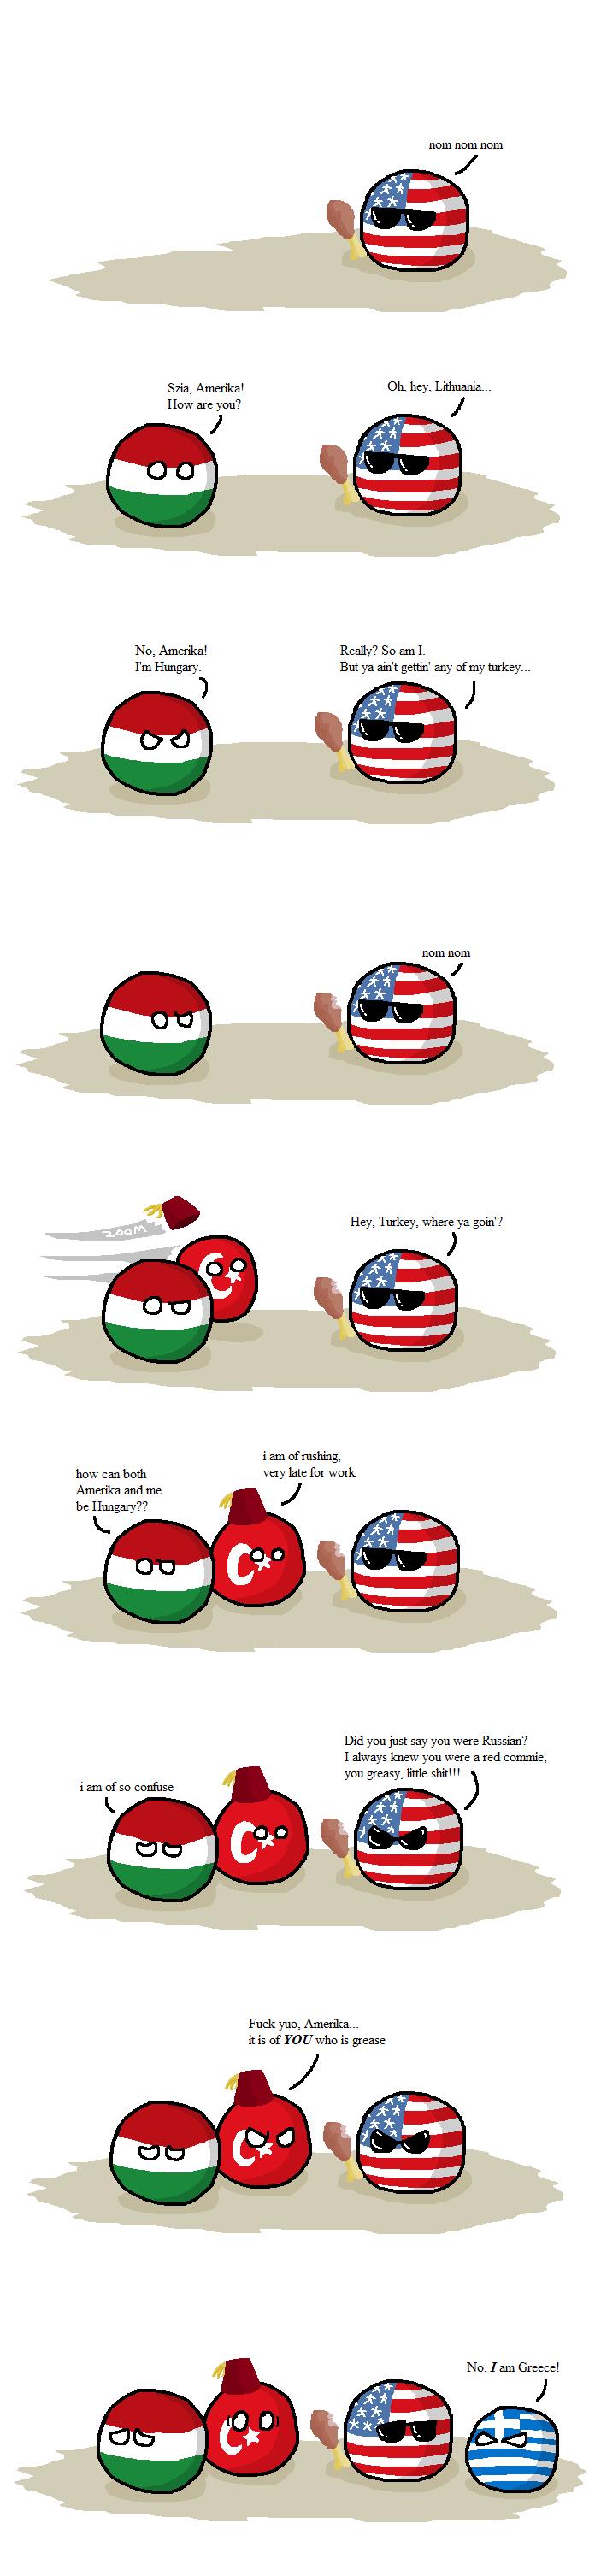 country-balls-mayhem-of-misconception